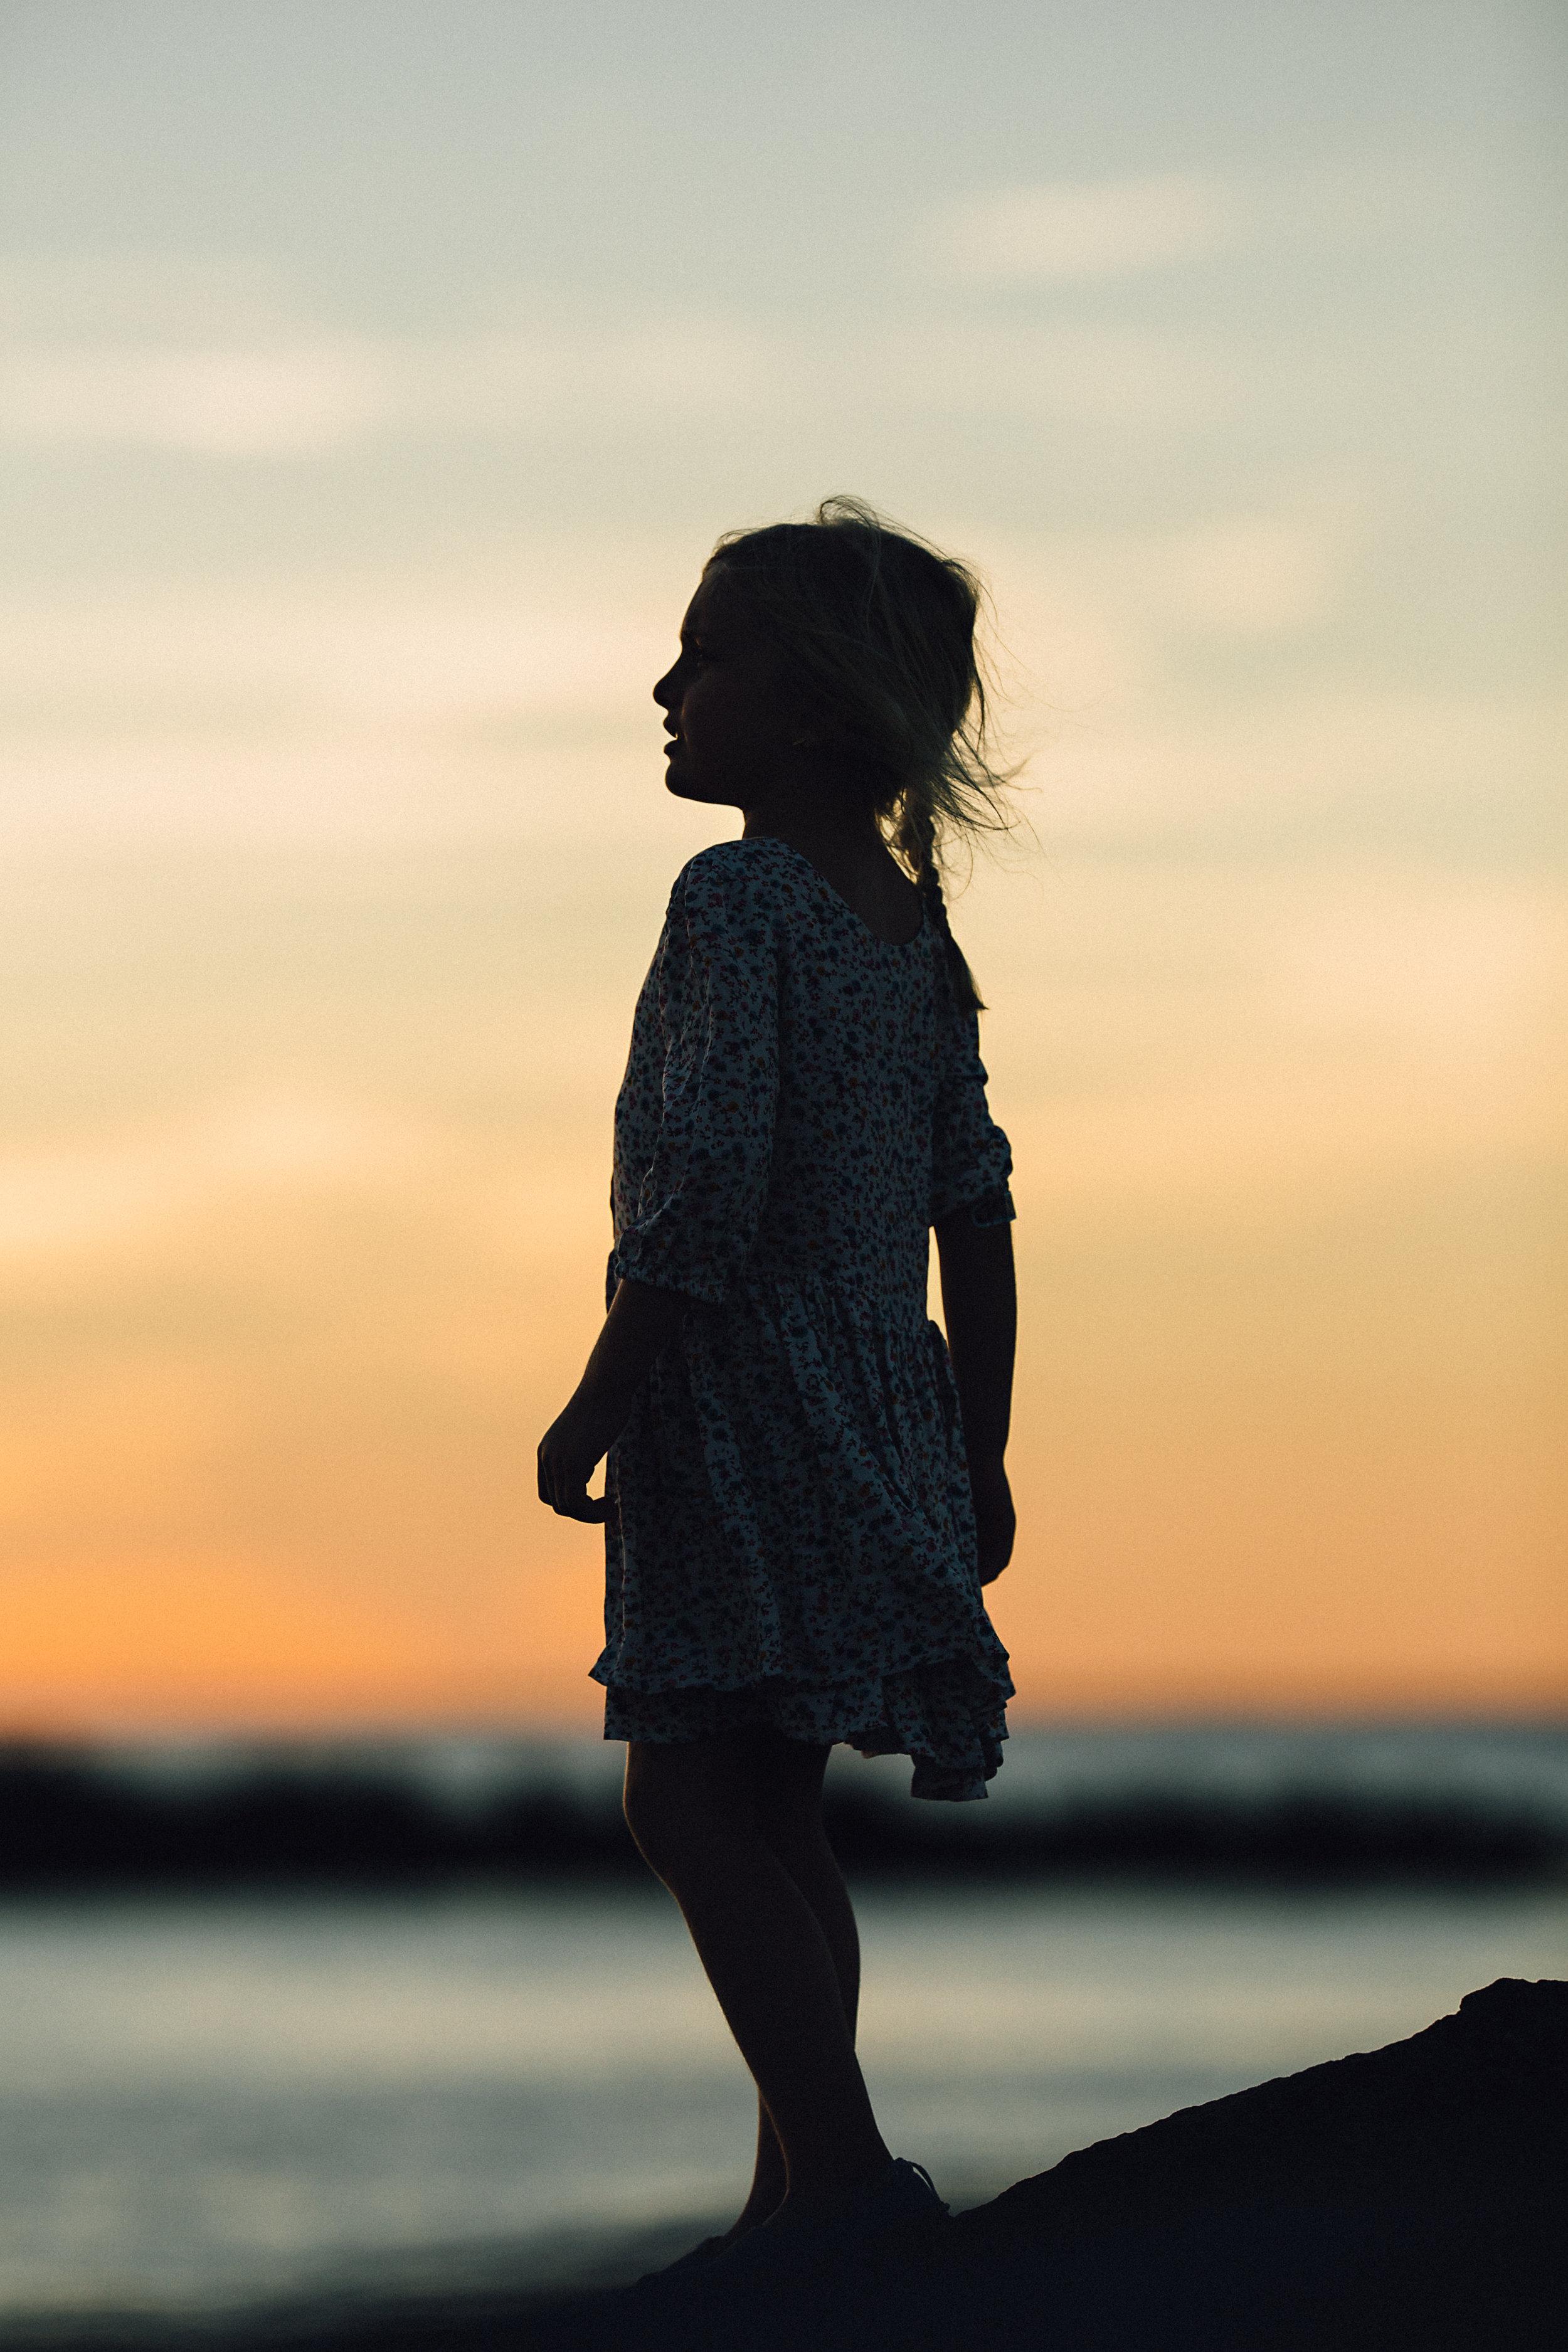 Hello-olivia-photography-Long-island-photography-children-session-family-lifestyle-silhouette-sinai-cedar-beach.jpg